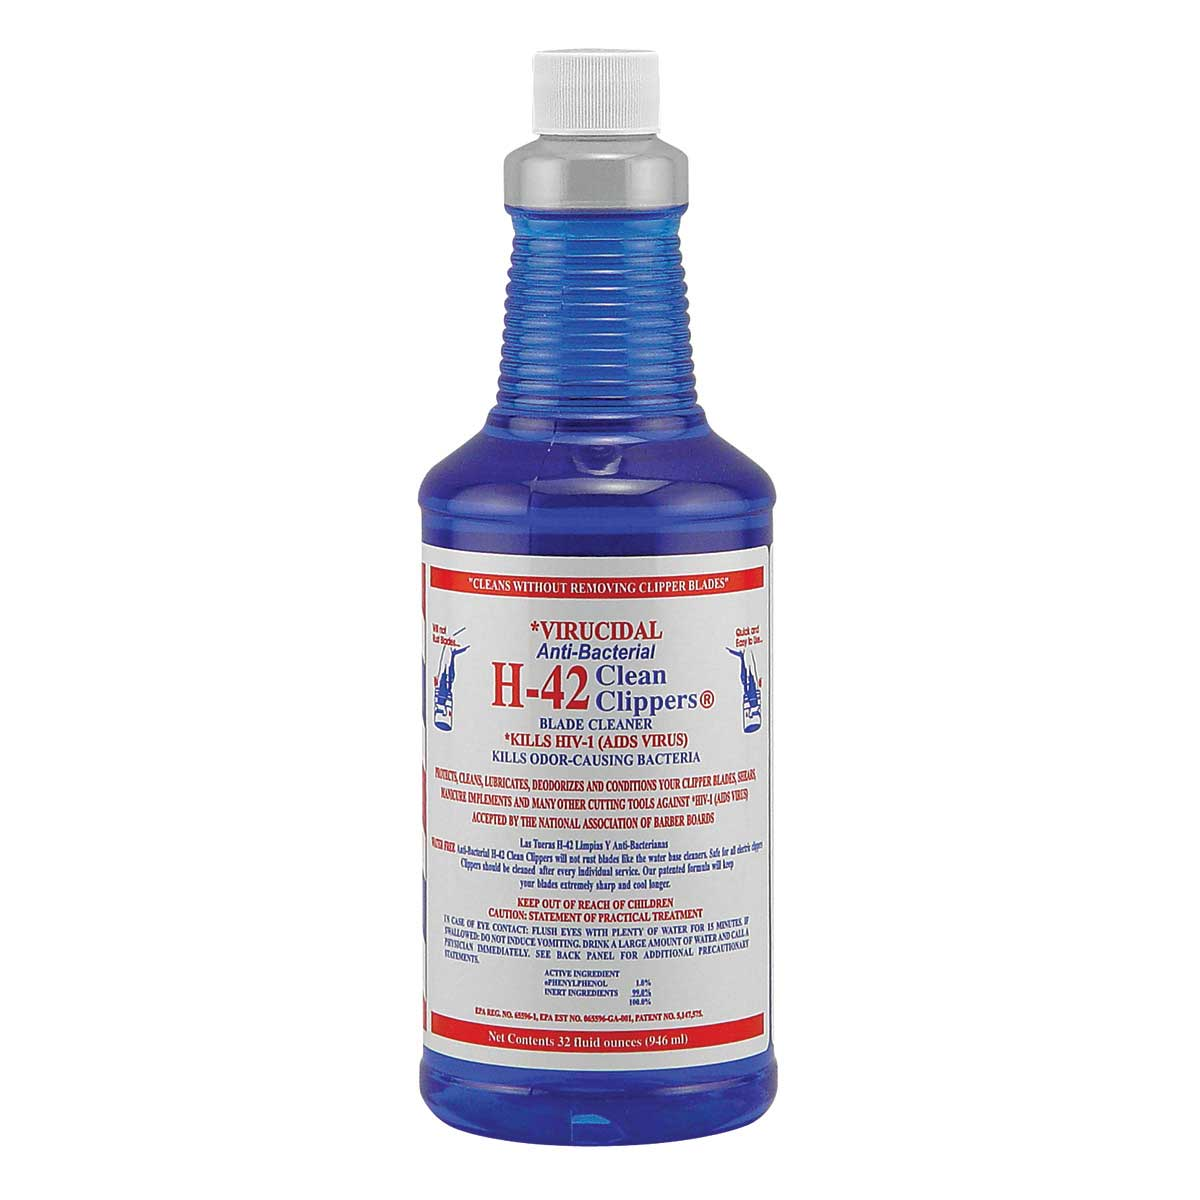 32 oz Jug Virucidal Anti-Bacterial H-42 Clean Clippers Blade Cleaner for Groomers